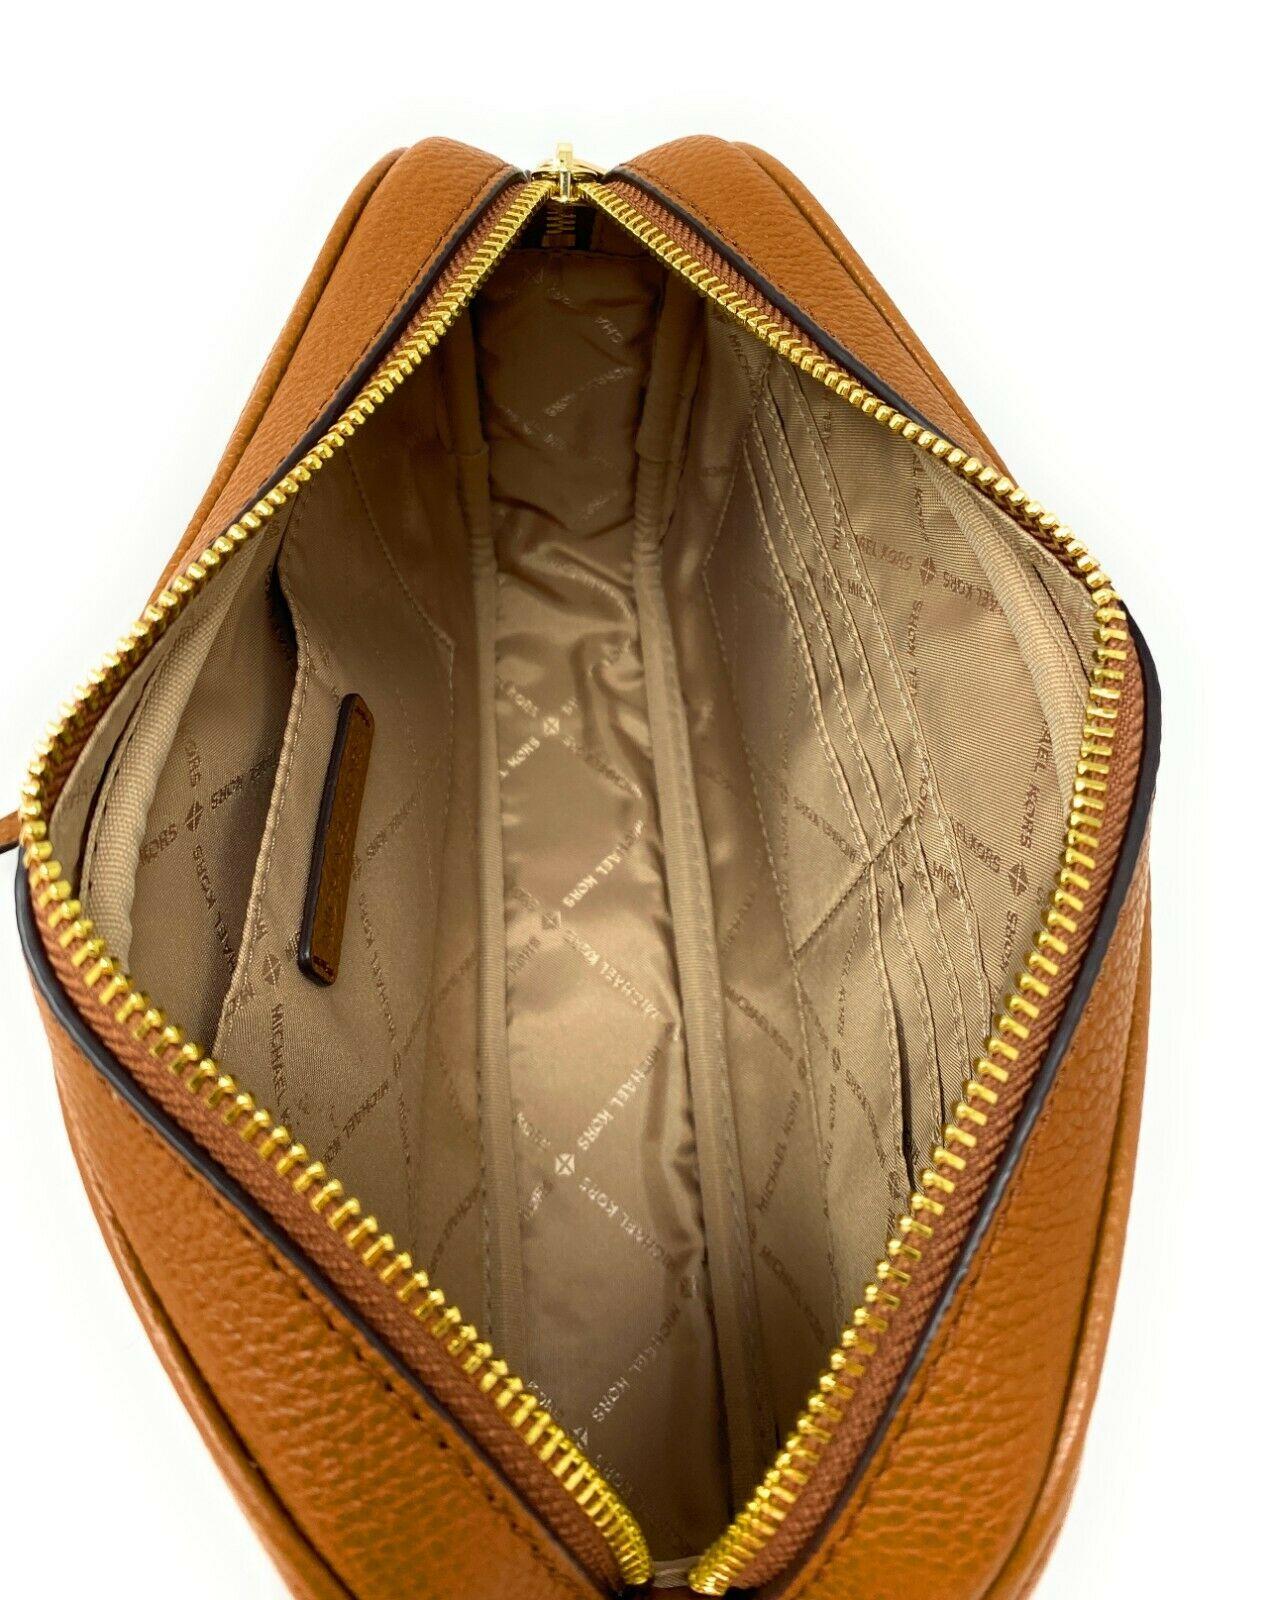 thumbnail 37 - Michael Kors Jet Set Item Large East West Crossbody Chain Handbag Clutch $298